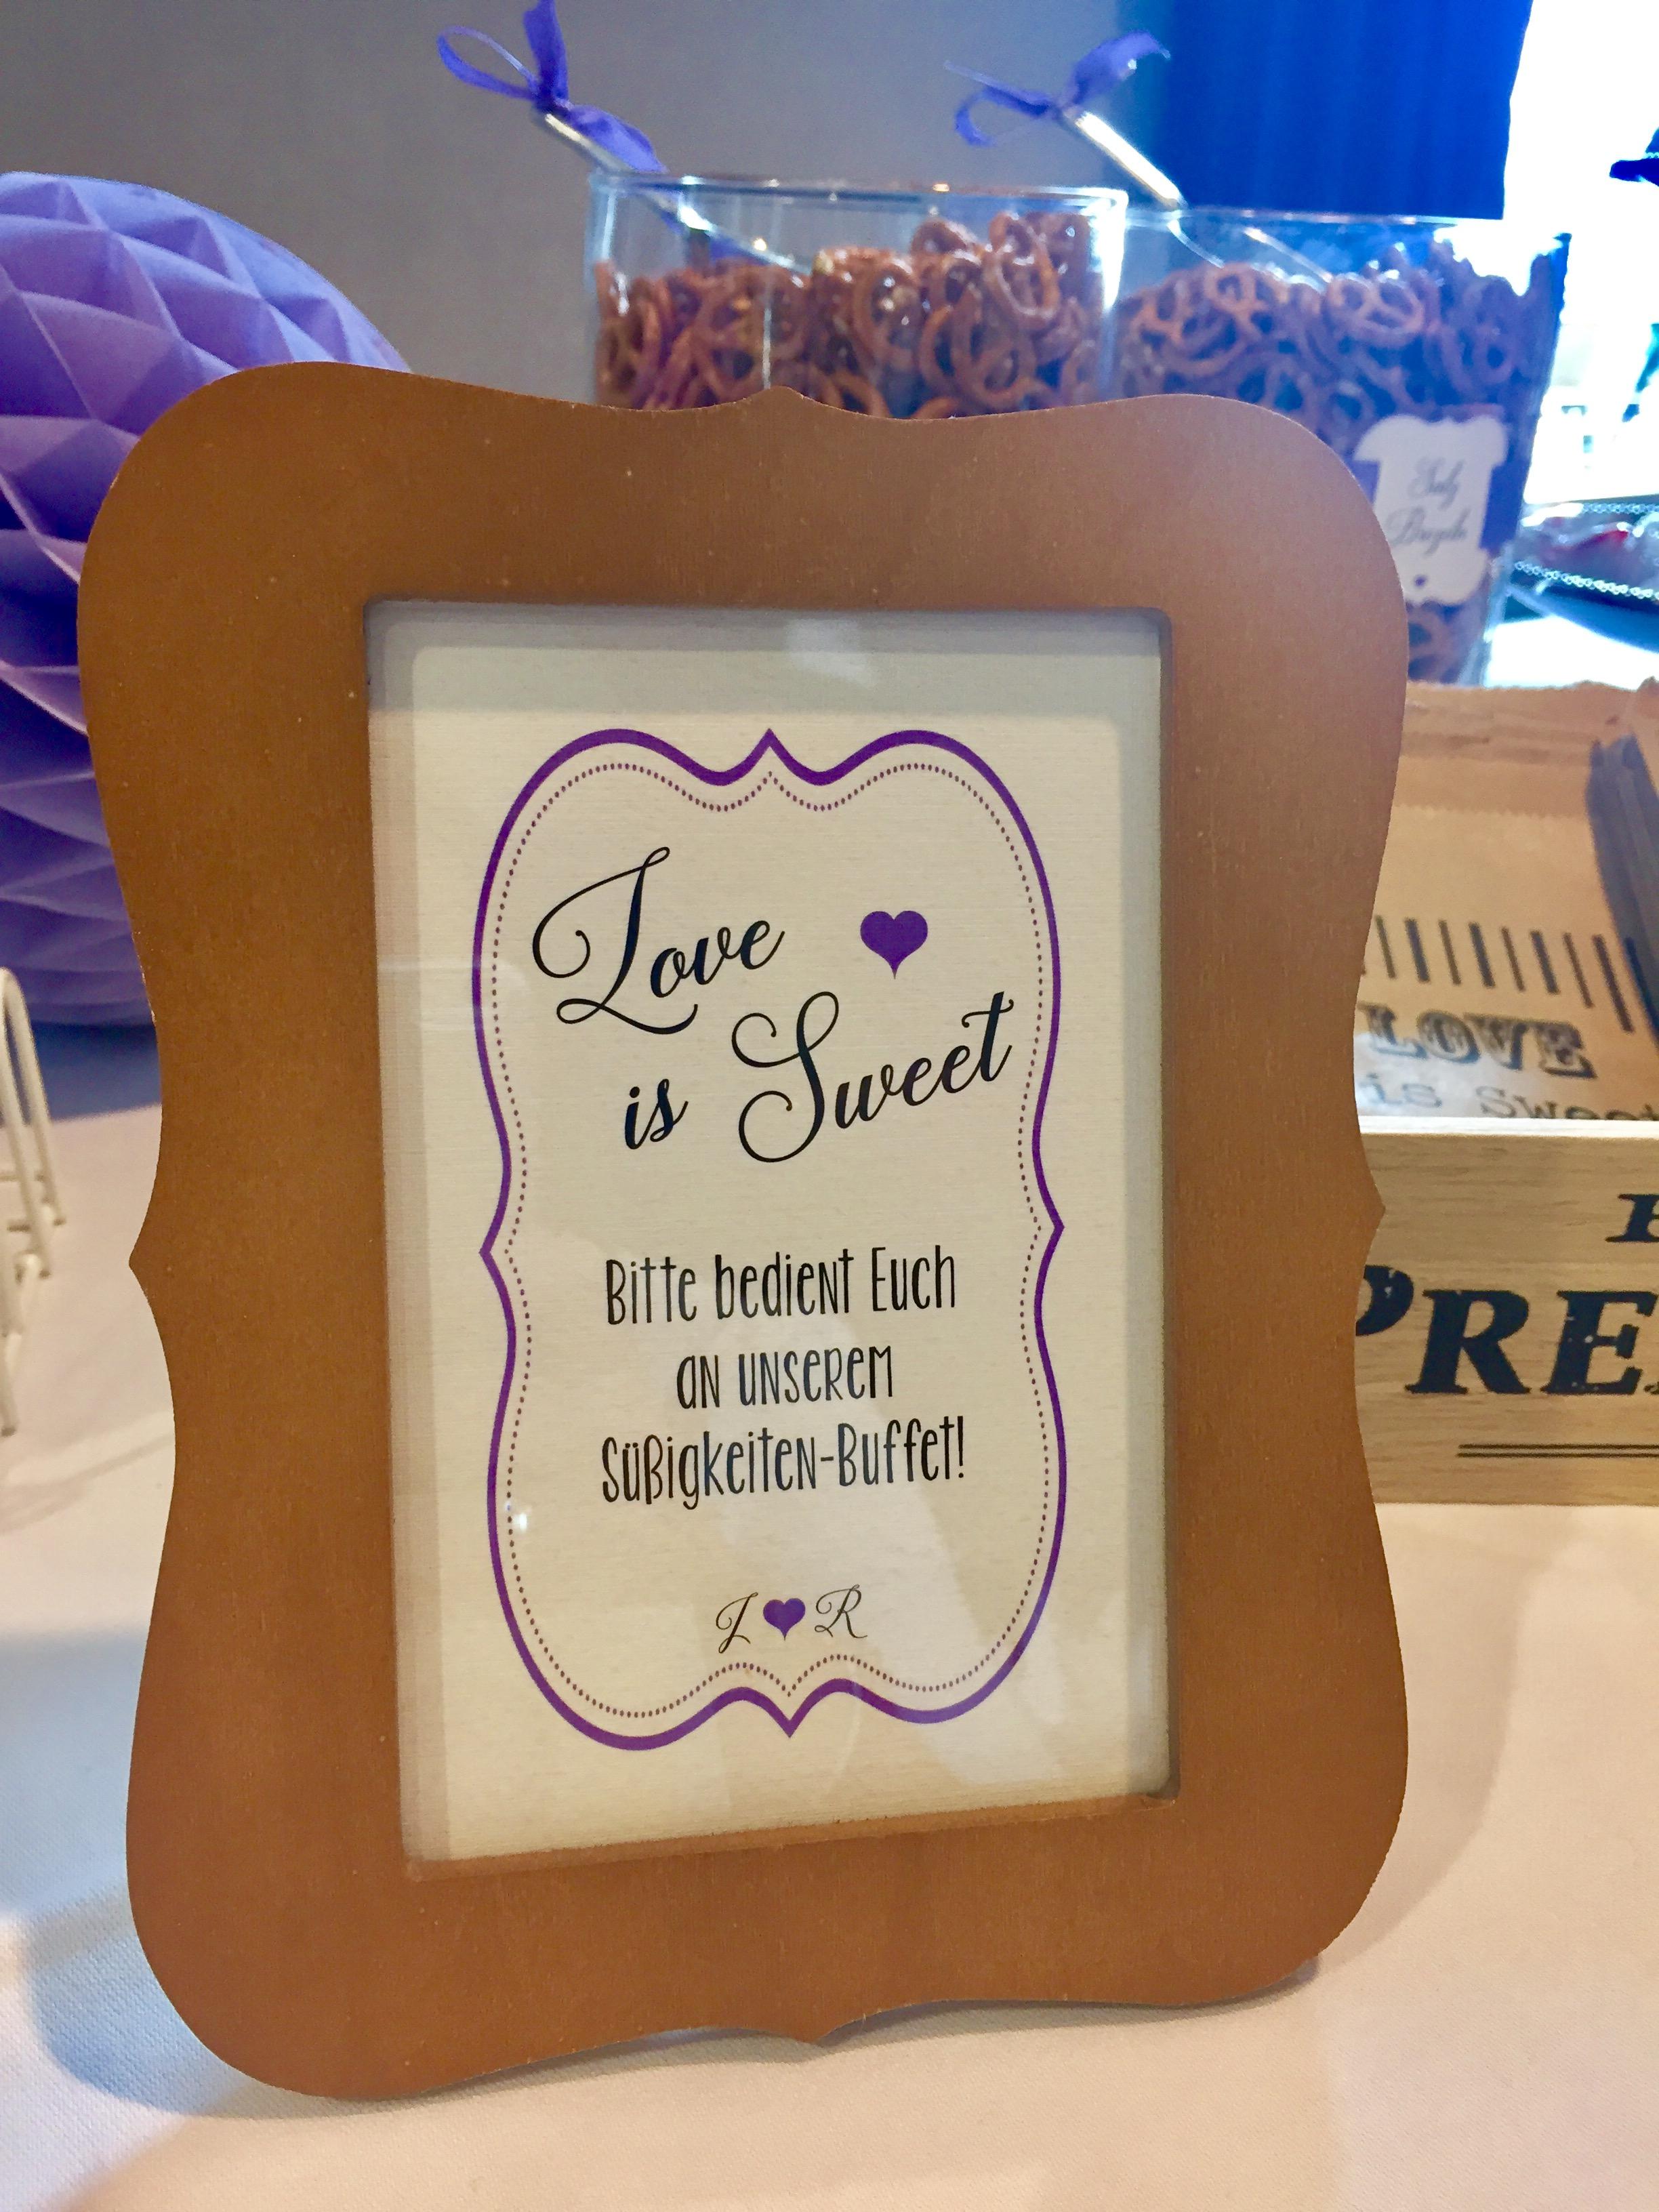 candybar-stuttgart-mieten-hochzeit-lila-aufsteller-love-is-sweet-personalisiert